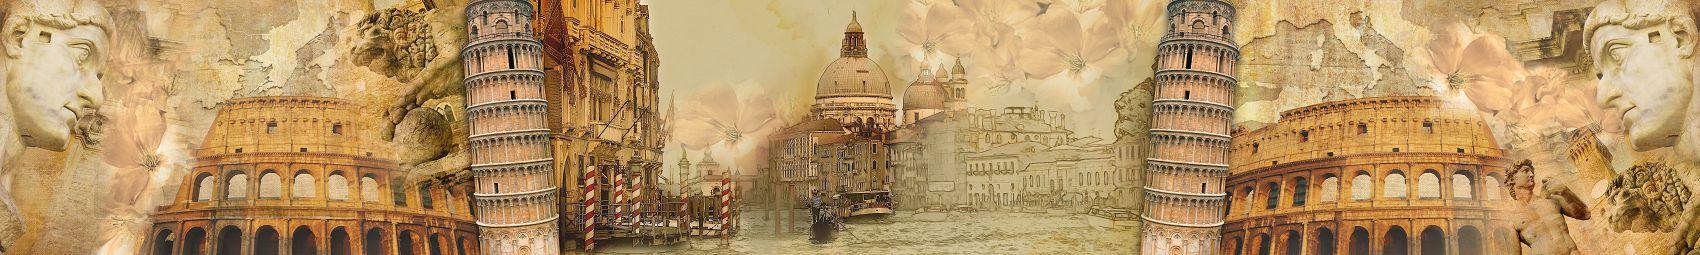 Скинали для кухни Венеция Рим